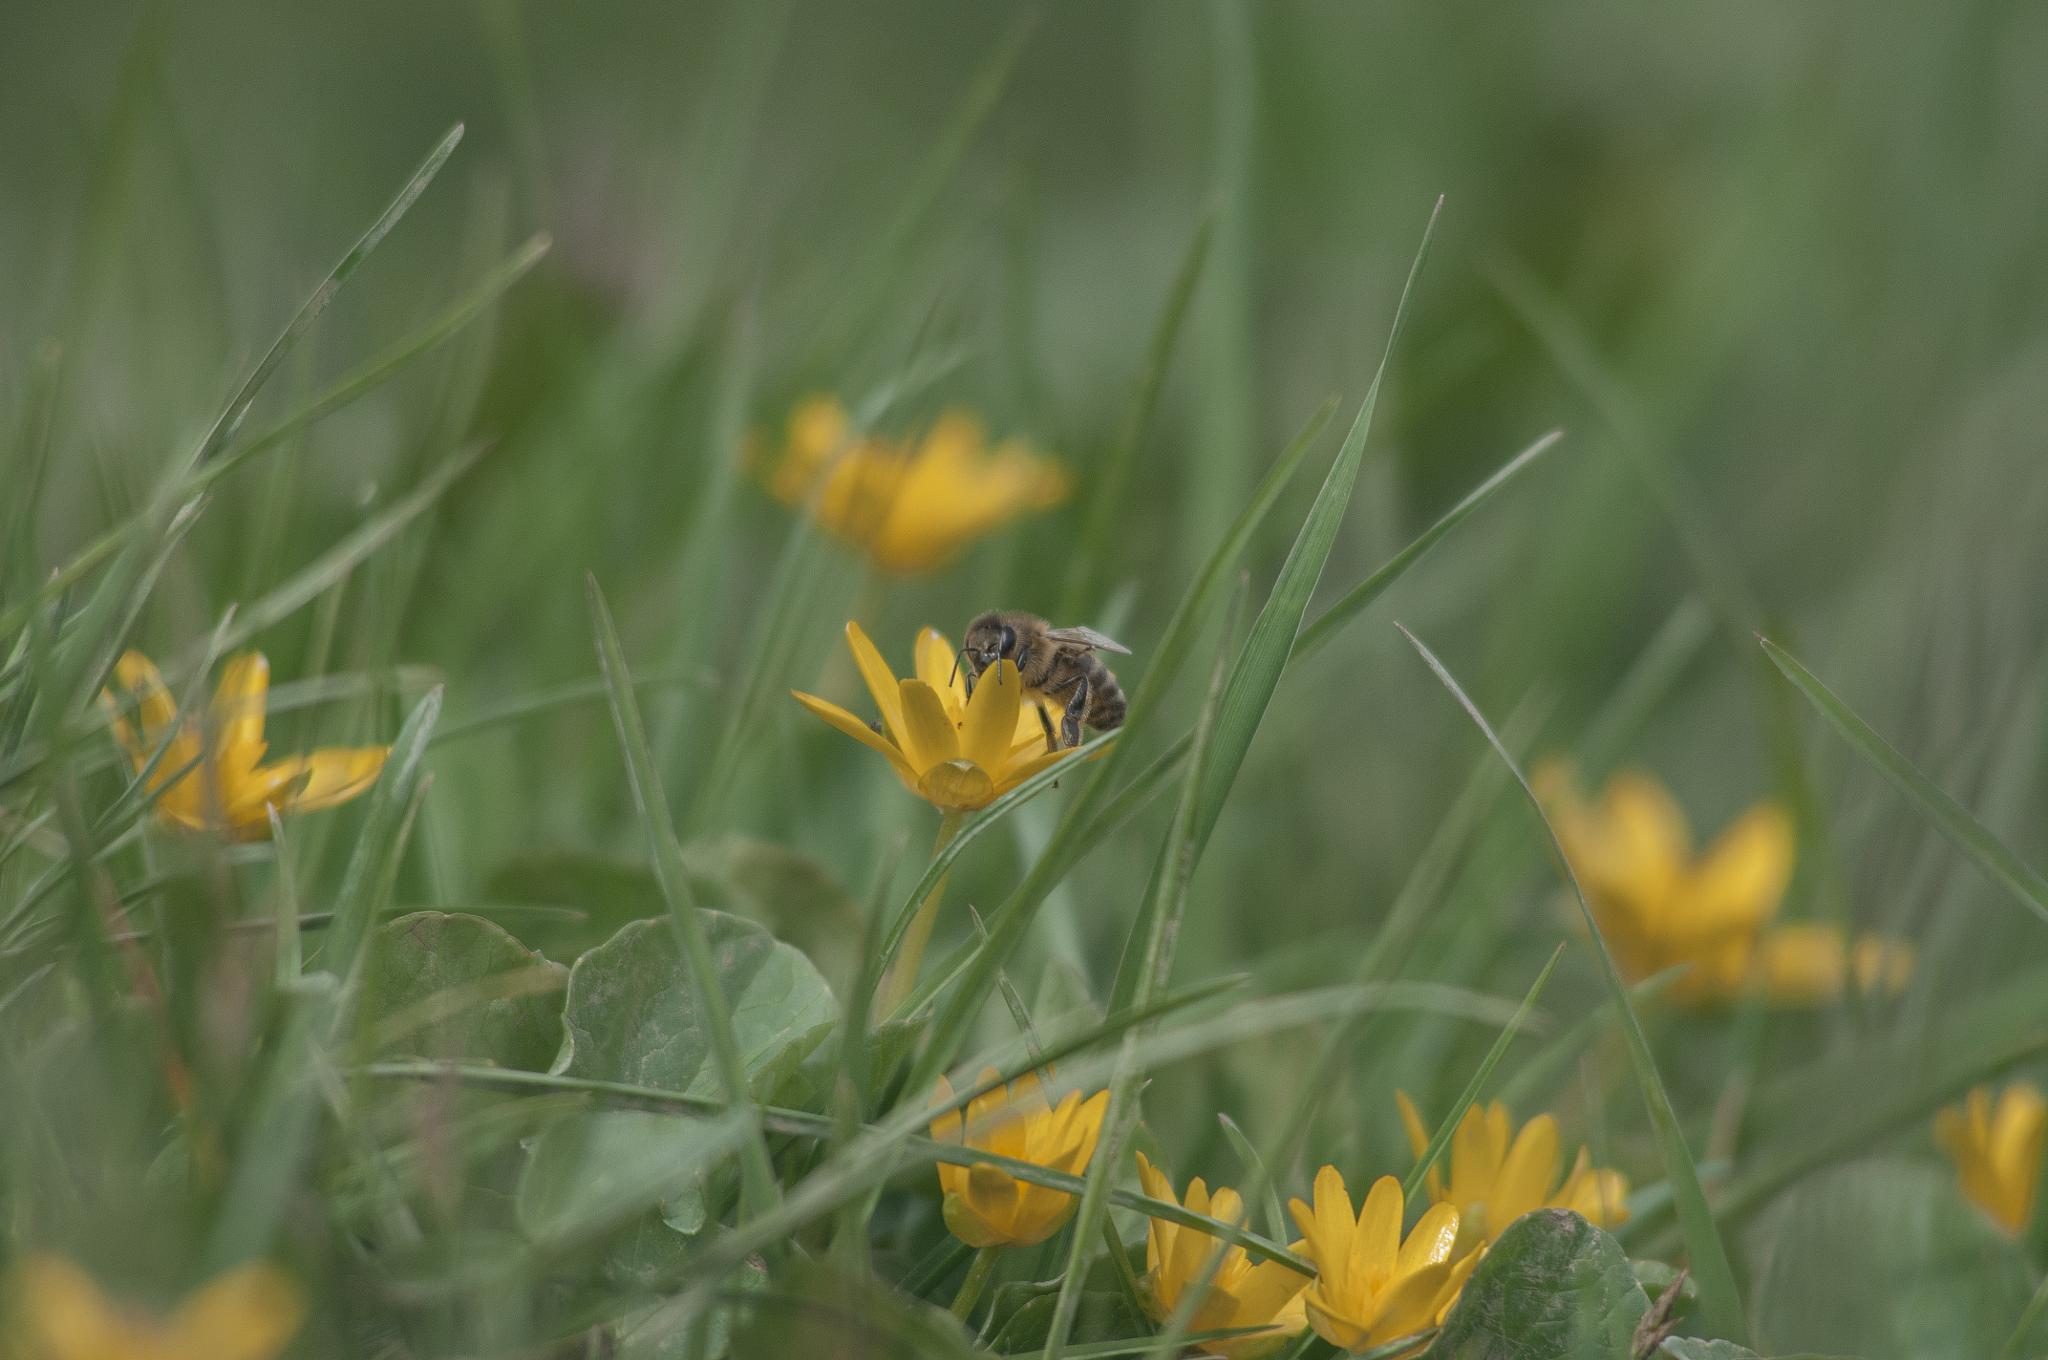 Bee by Homoki Gabi